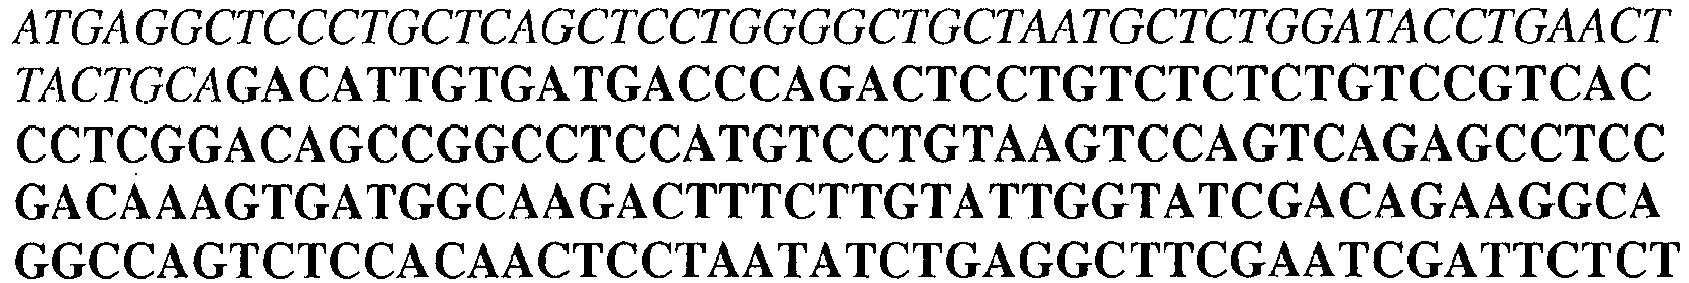 Figure imgb0413